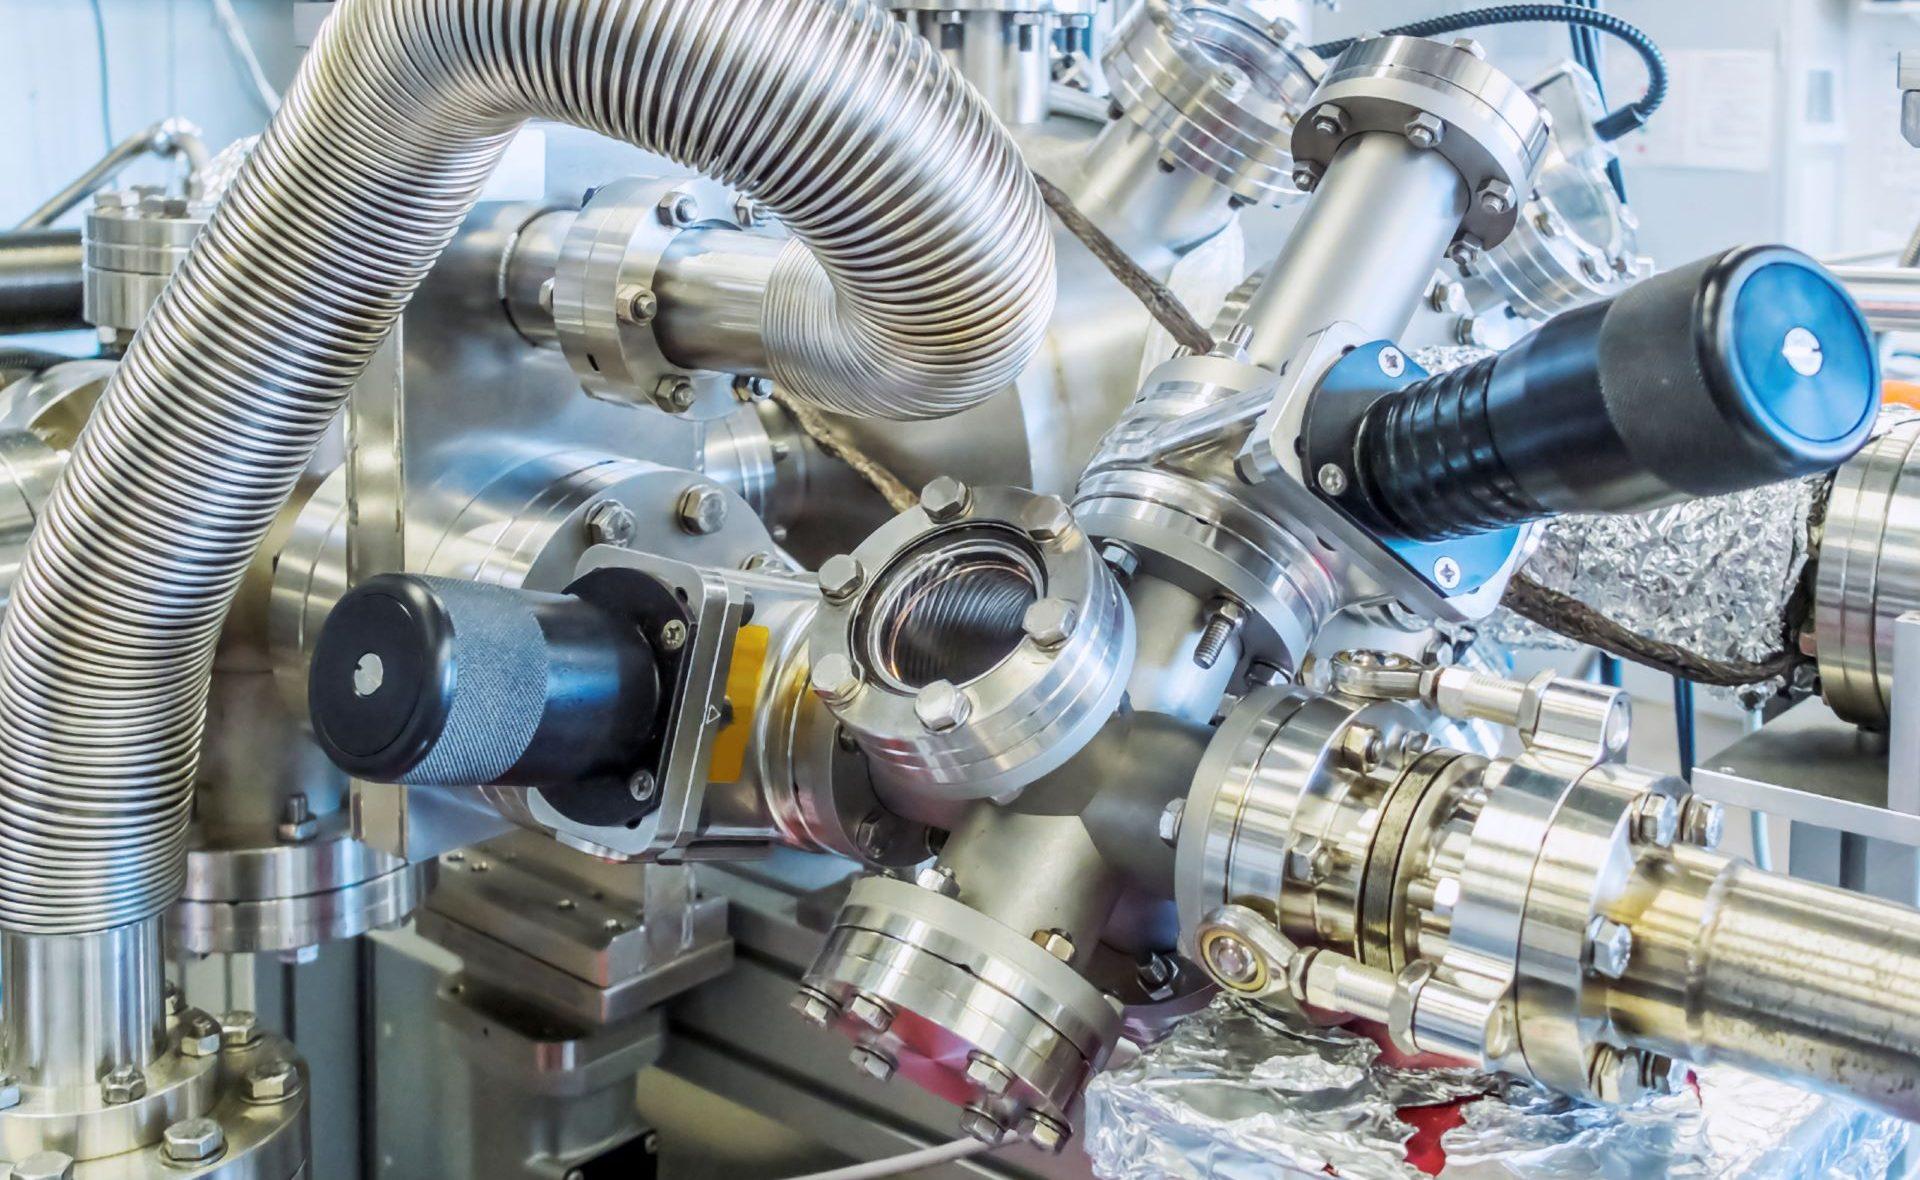 high-end gas turbine analysis services - Scientific Equipment